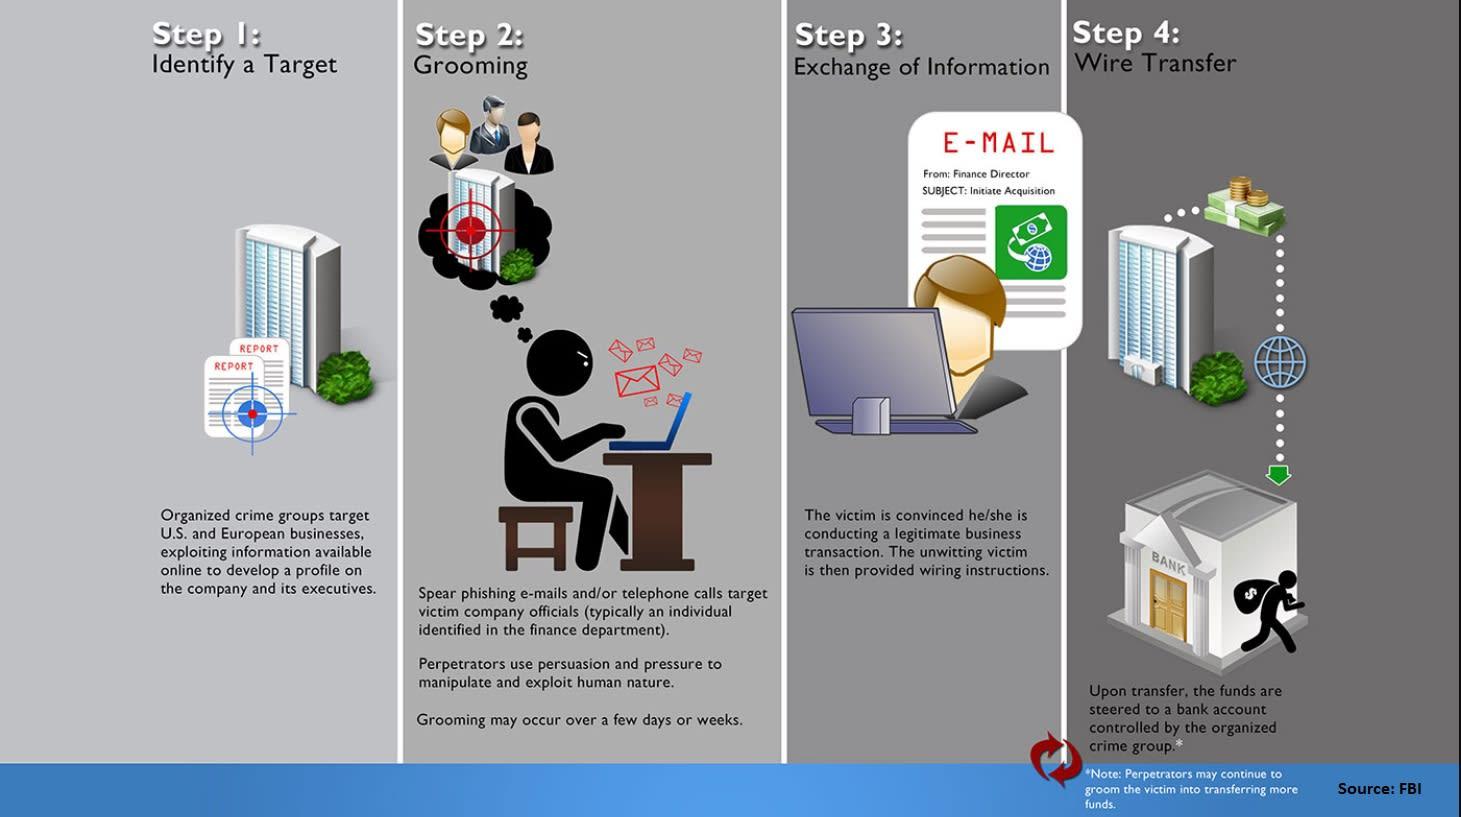 FBI Infographic Email Scam 180201 EC MERCADO